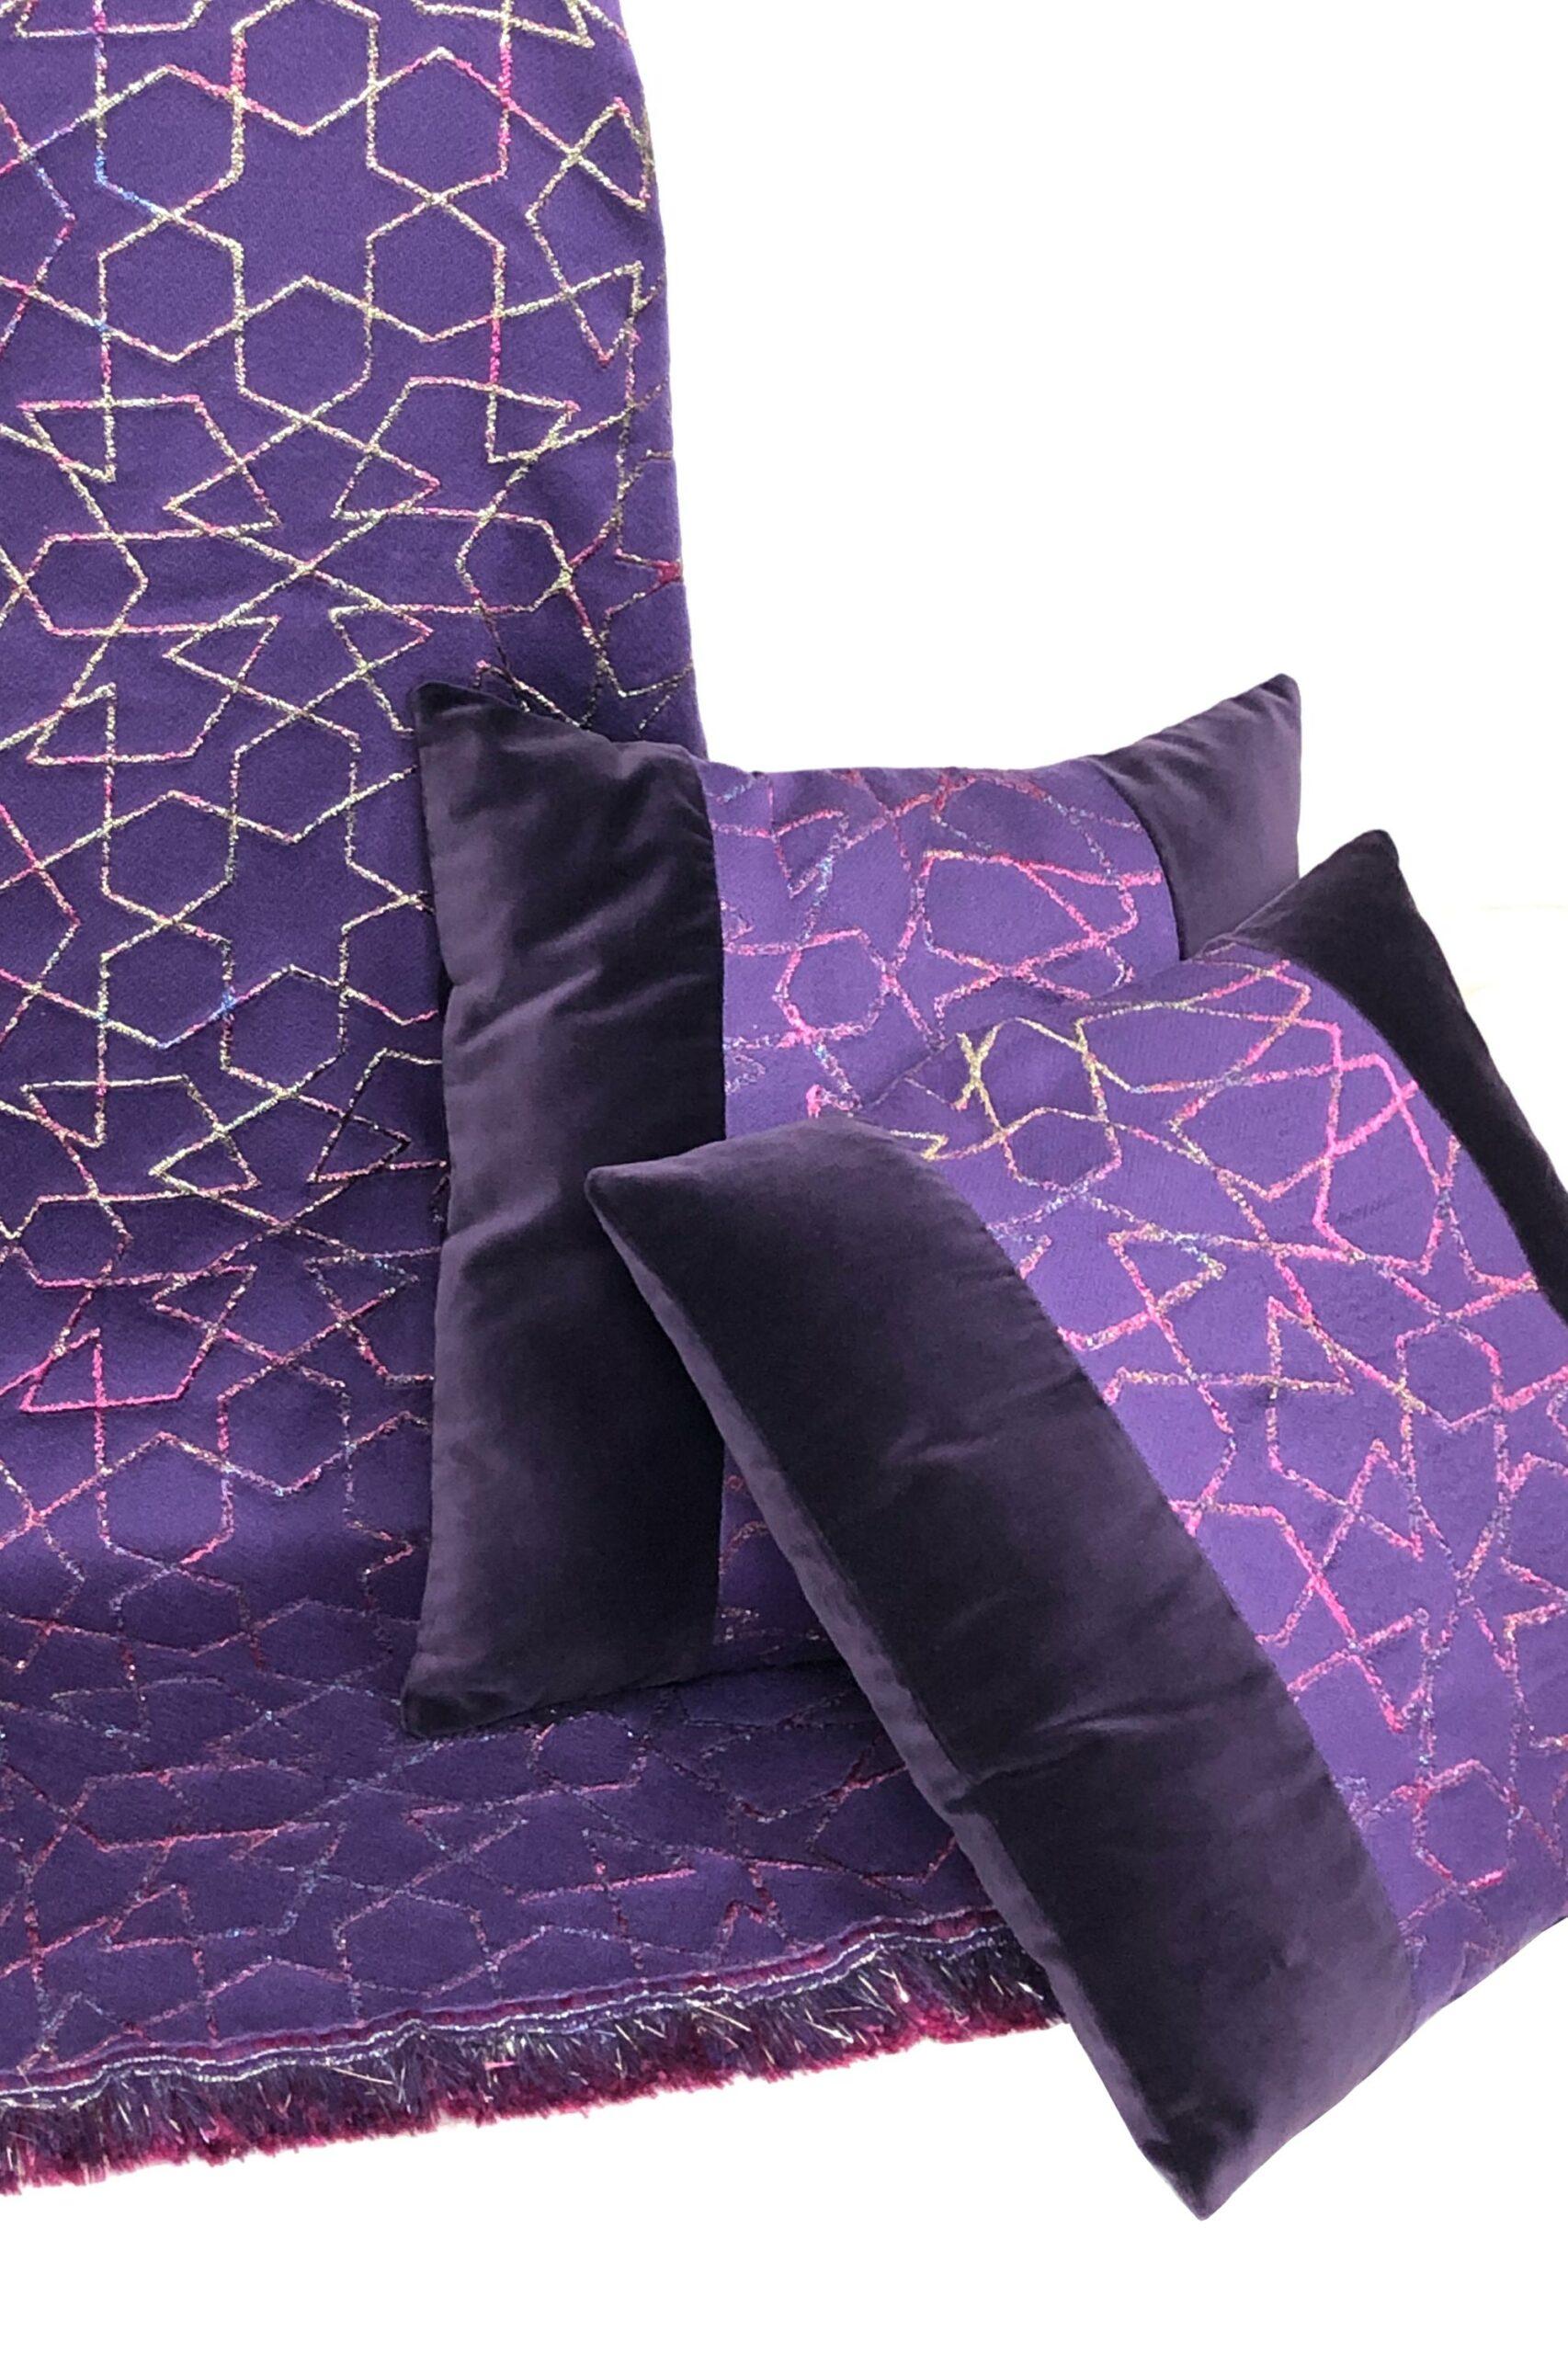 home textile interior design-cushion - wall art - geometric pattern galaxy violet